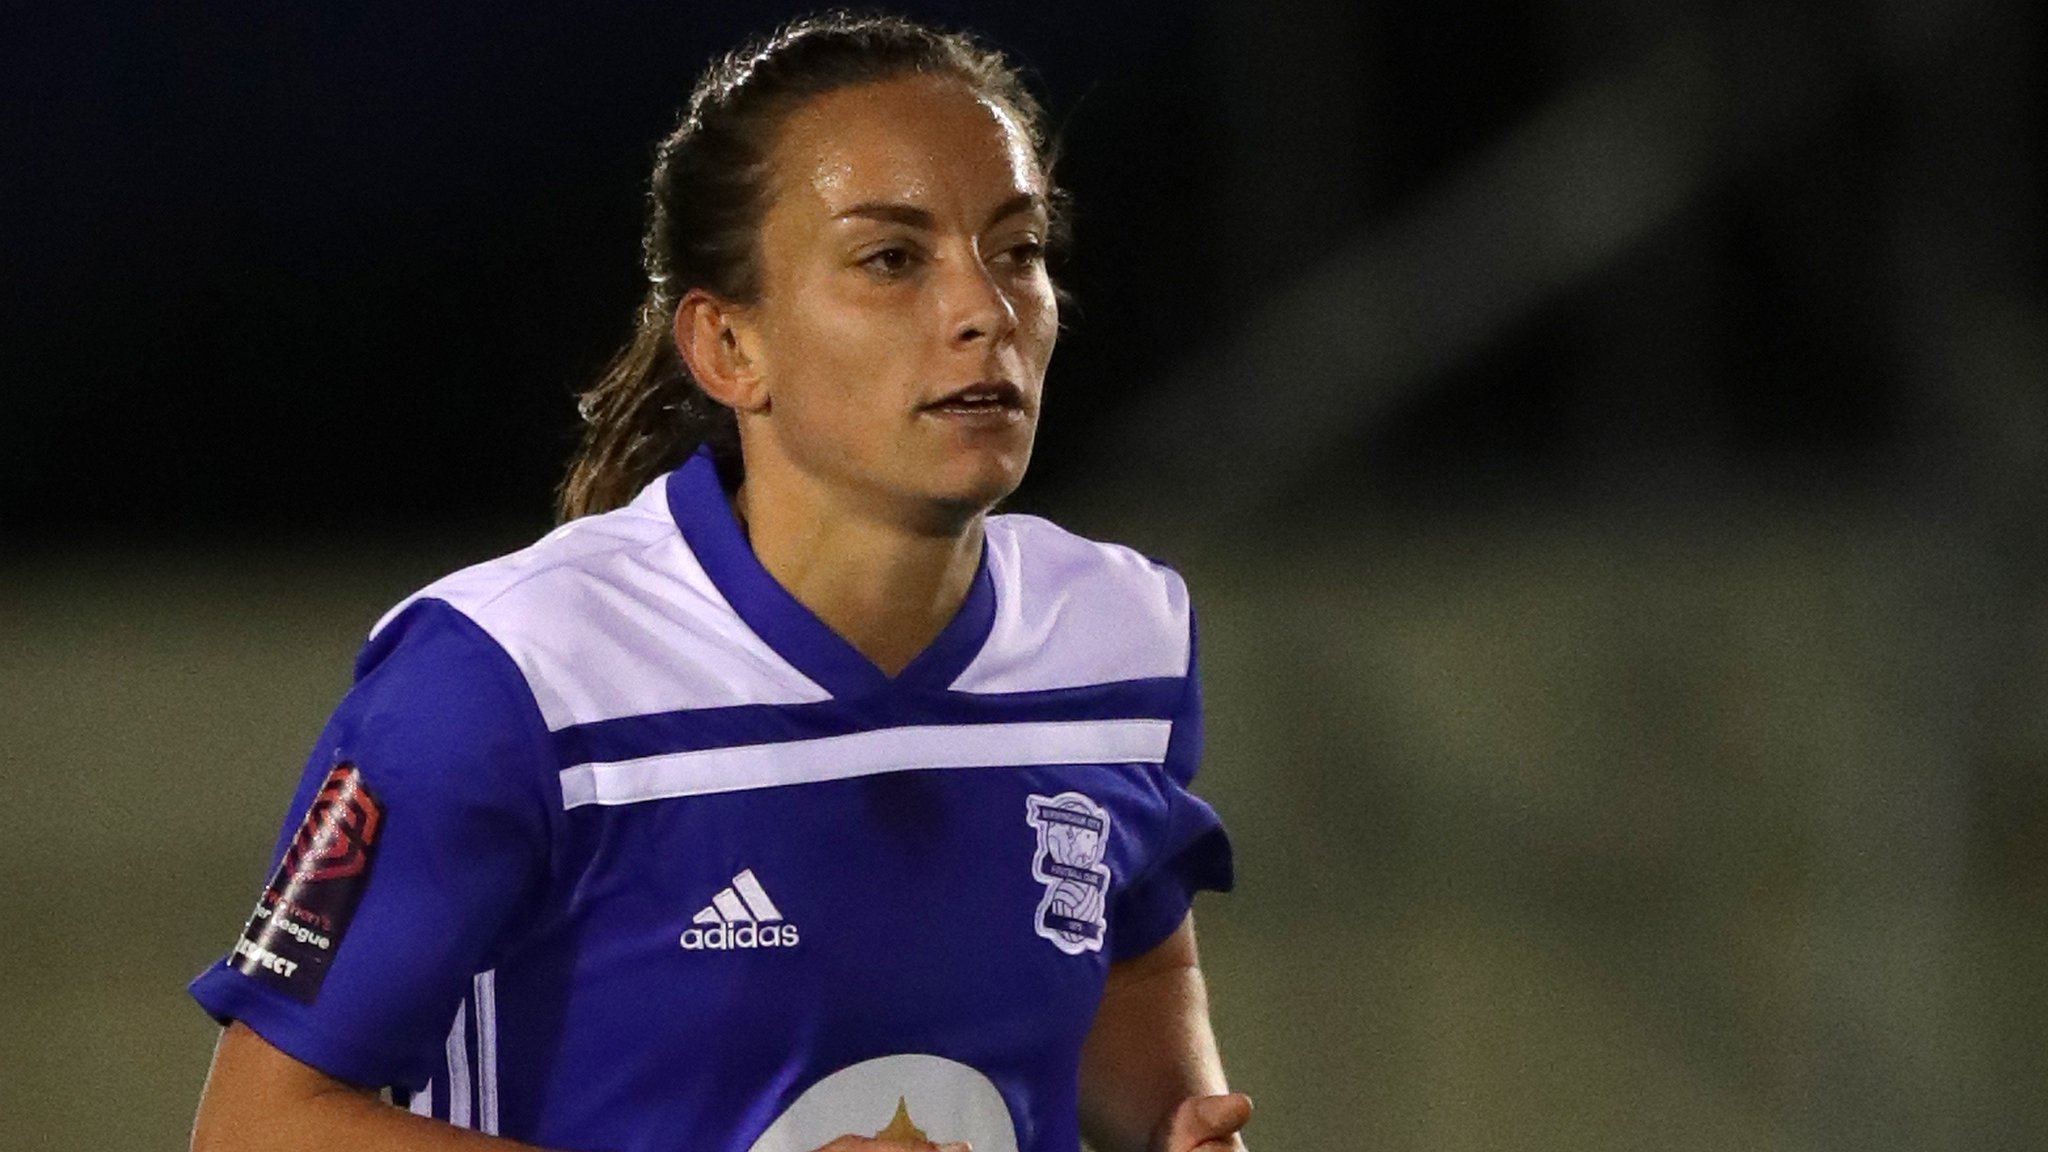 Birmingham City Women 3-0 West Ham United Women